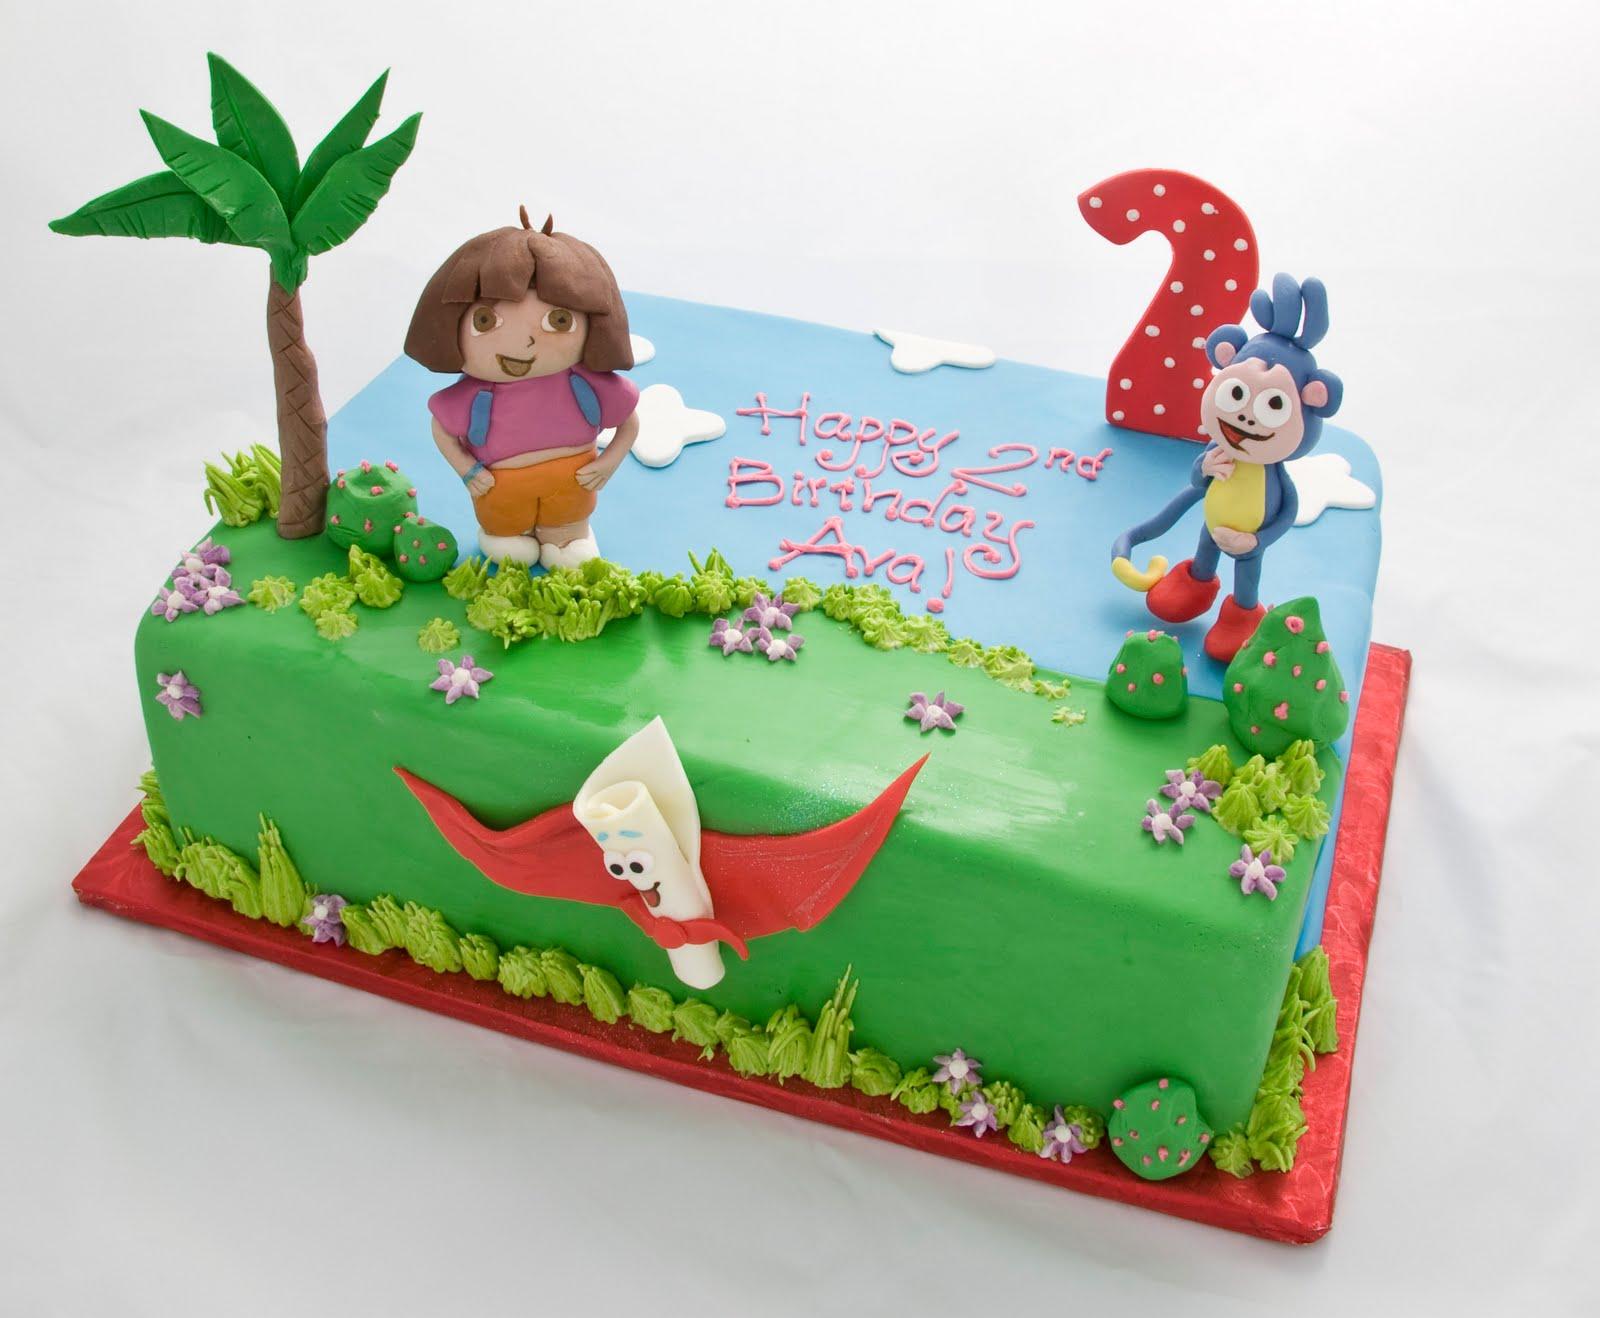 The Crimson Cake Blog: Dora and Boots Cake